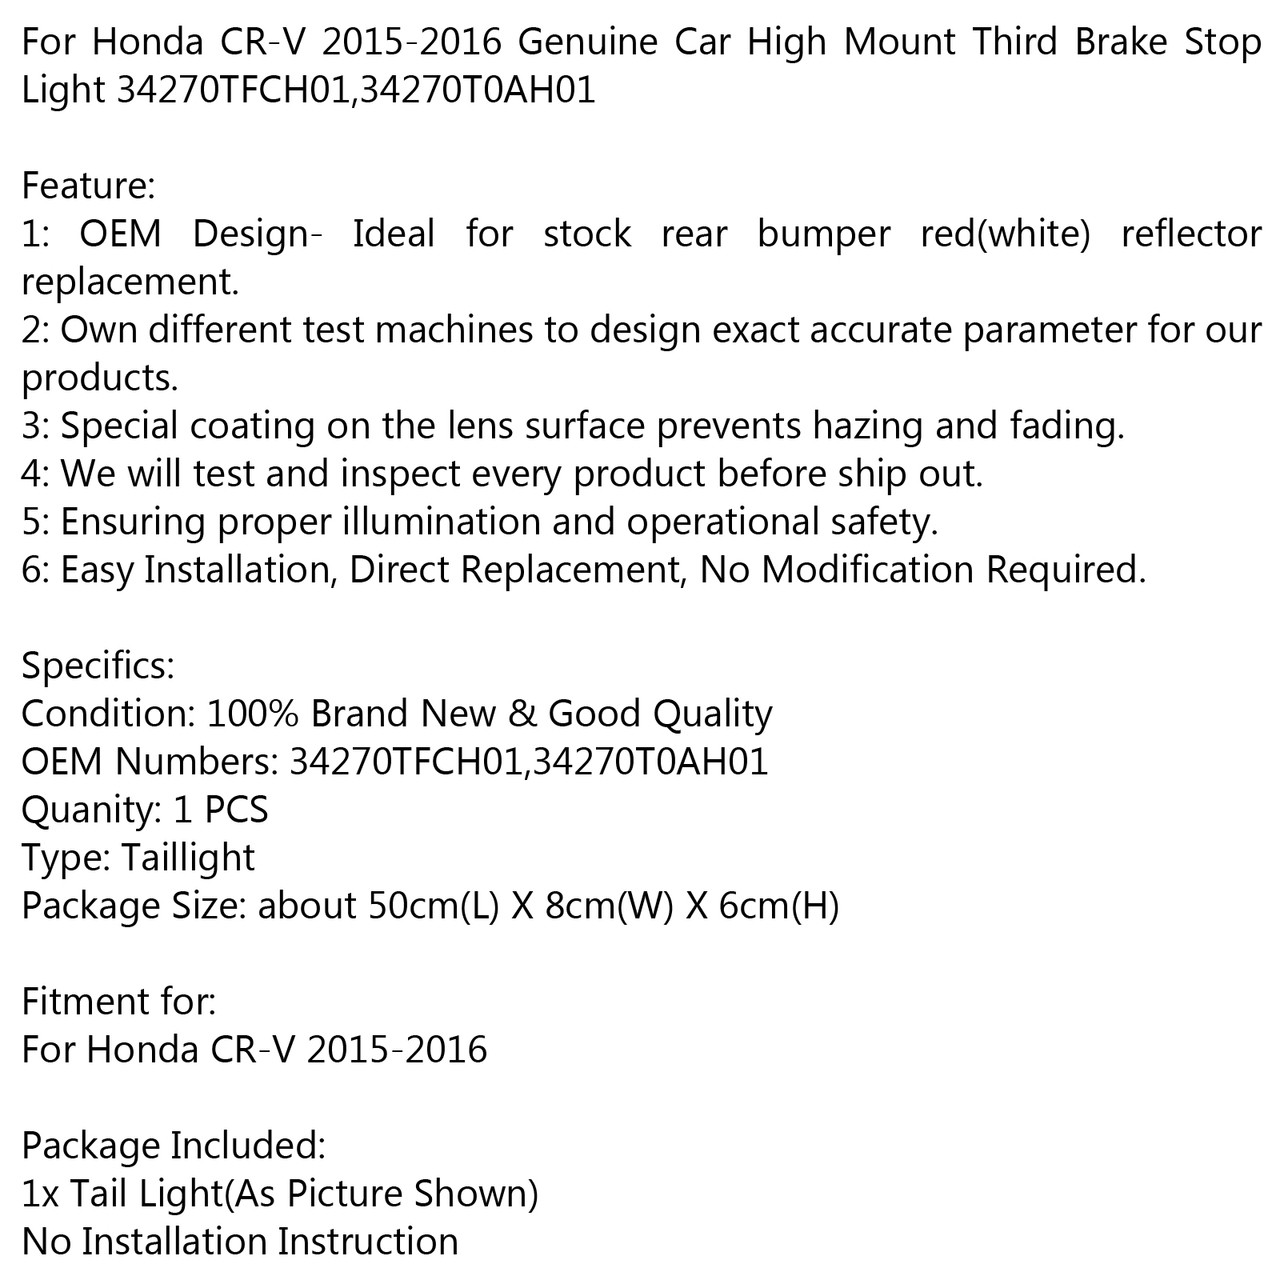 Genuine Car High Mount 3RD Brake Stop Light 34270TFCH01 For Honda CR-V 2015-2016 Genuine Car High Mount 3RD Brake Stop Light 34270TFCH01 RD